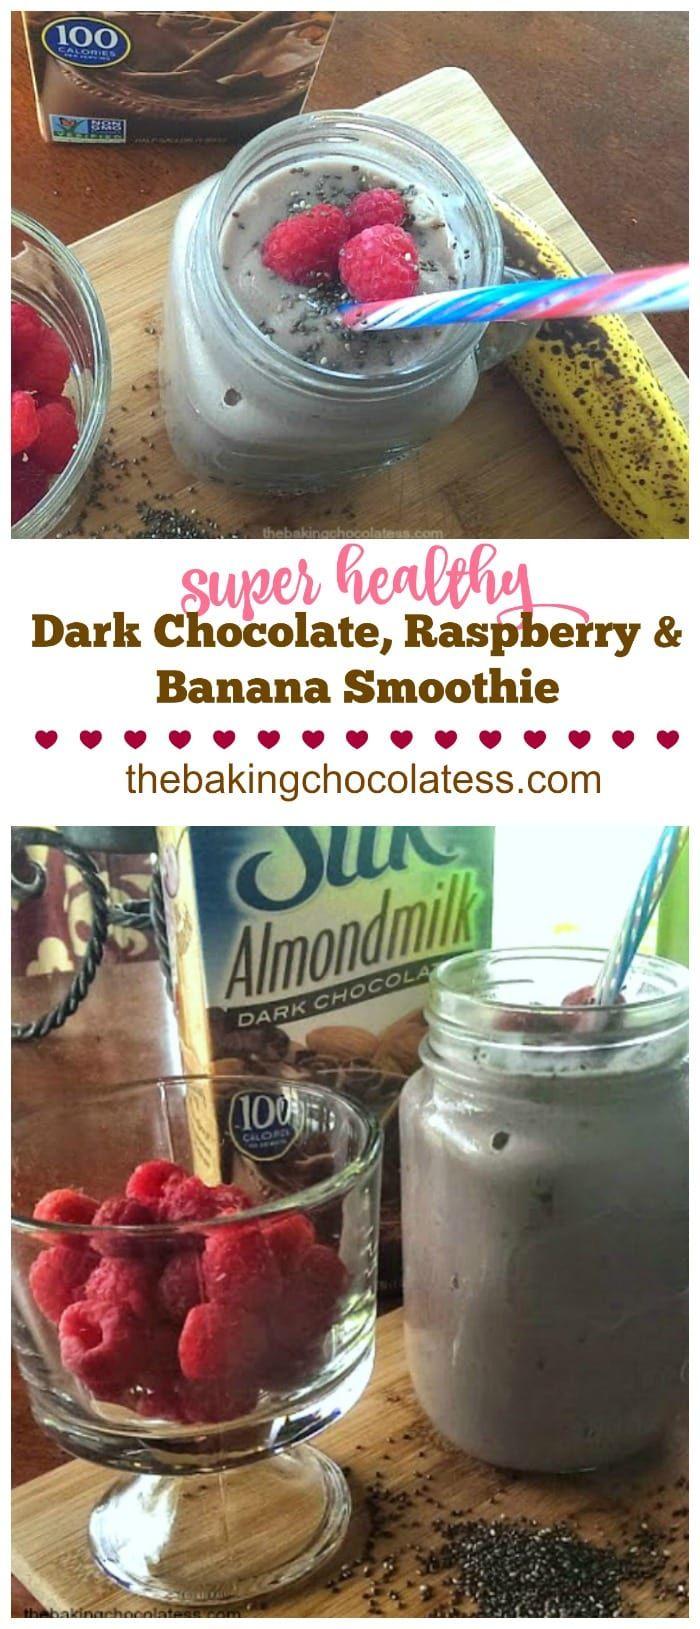 Super Healthy Dark Chocolate, Raspberry & Banana Smoothie {Greek Yogurt, Chia Seeds & Protein!}